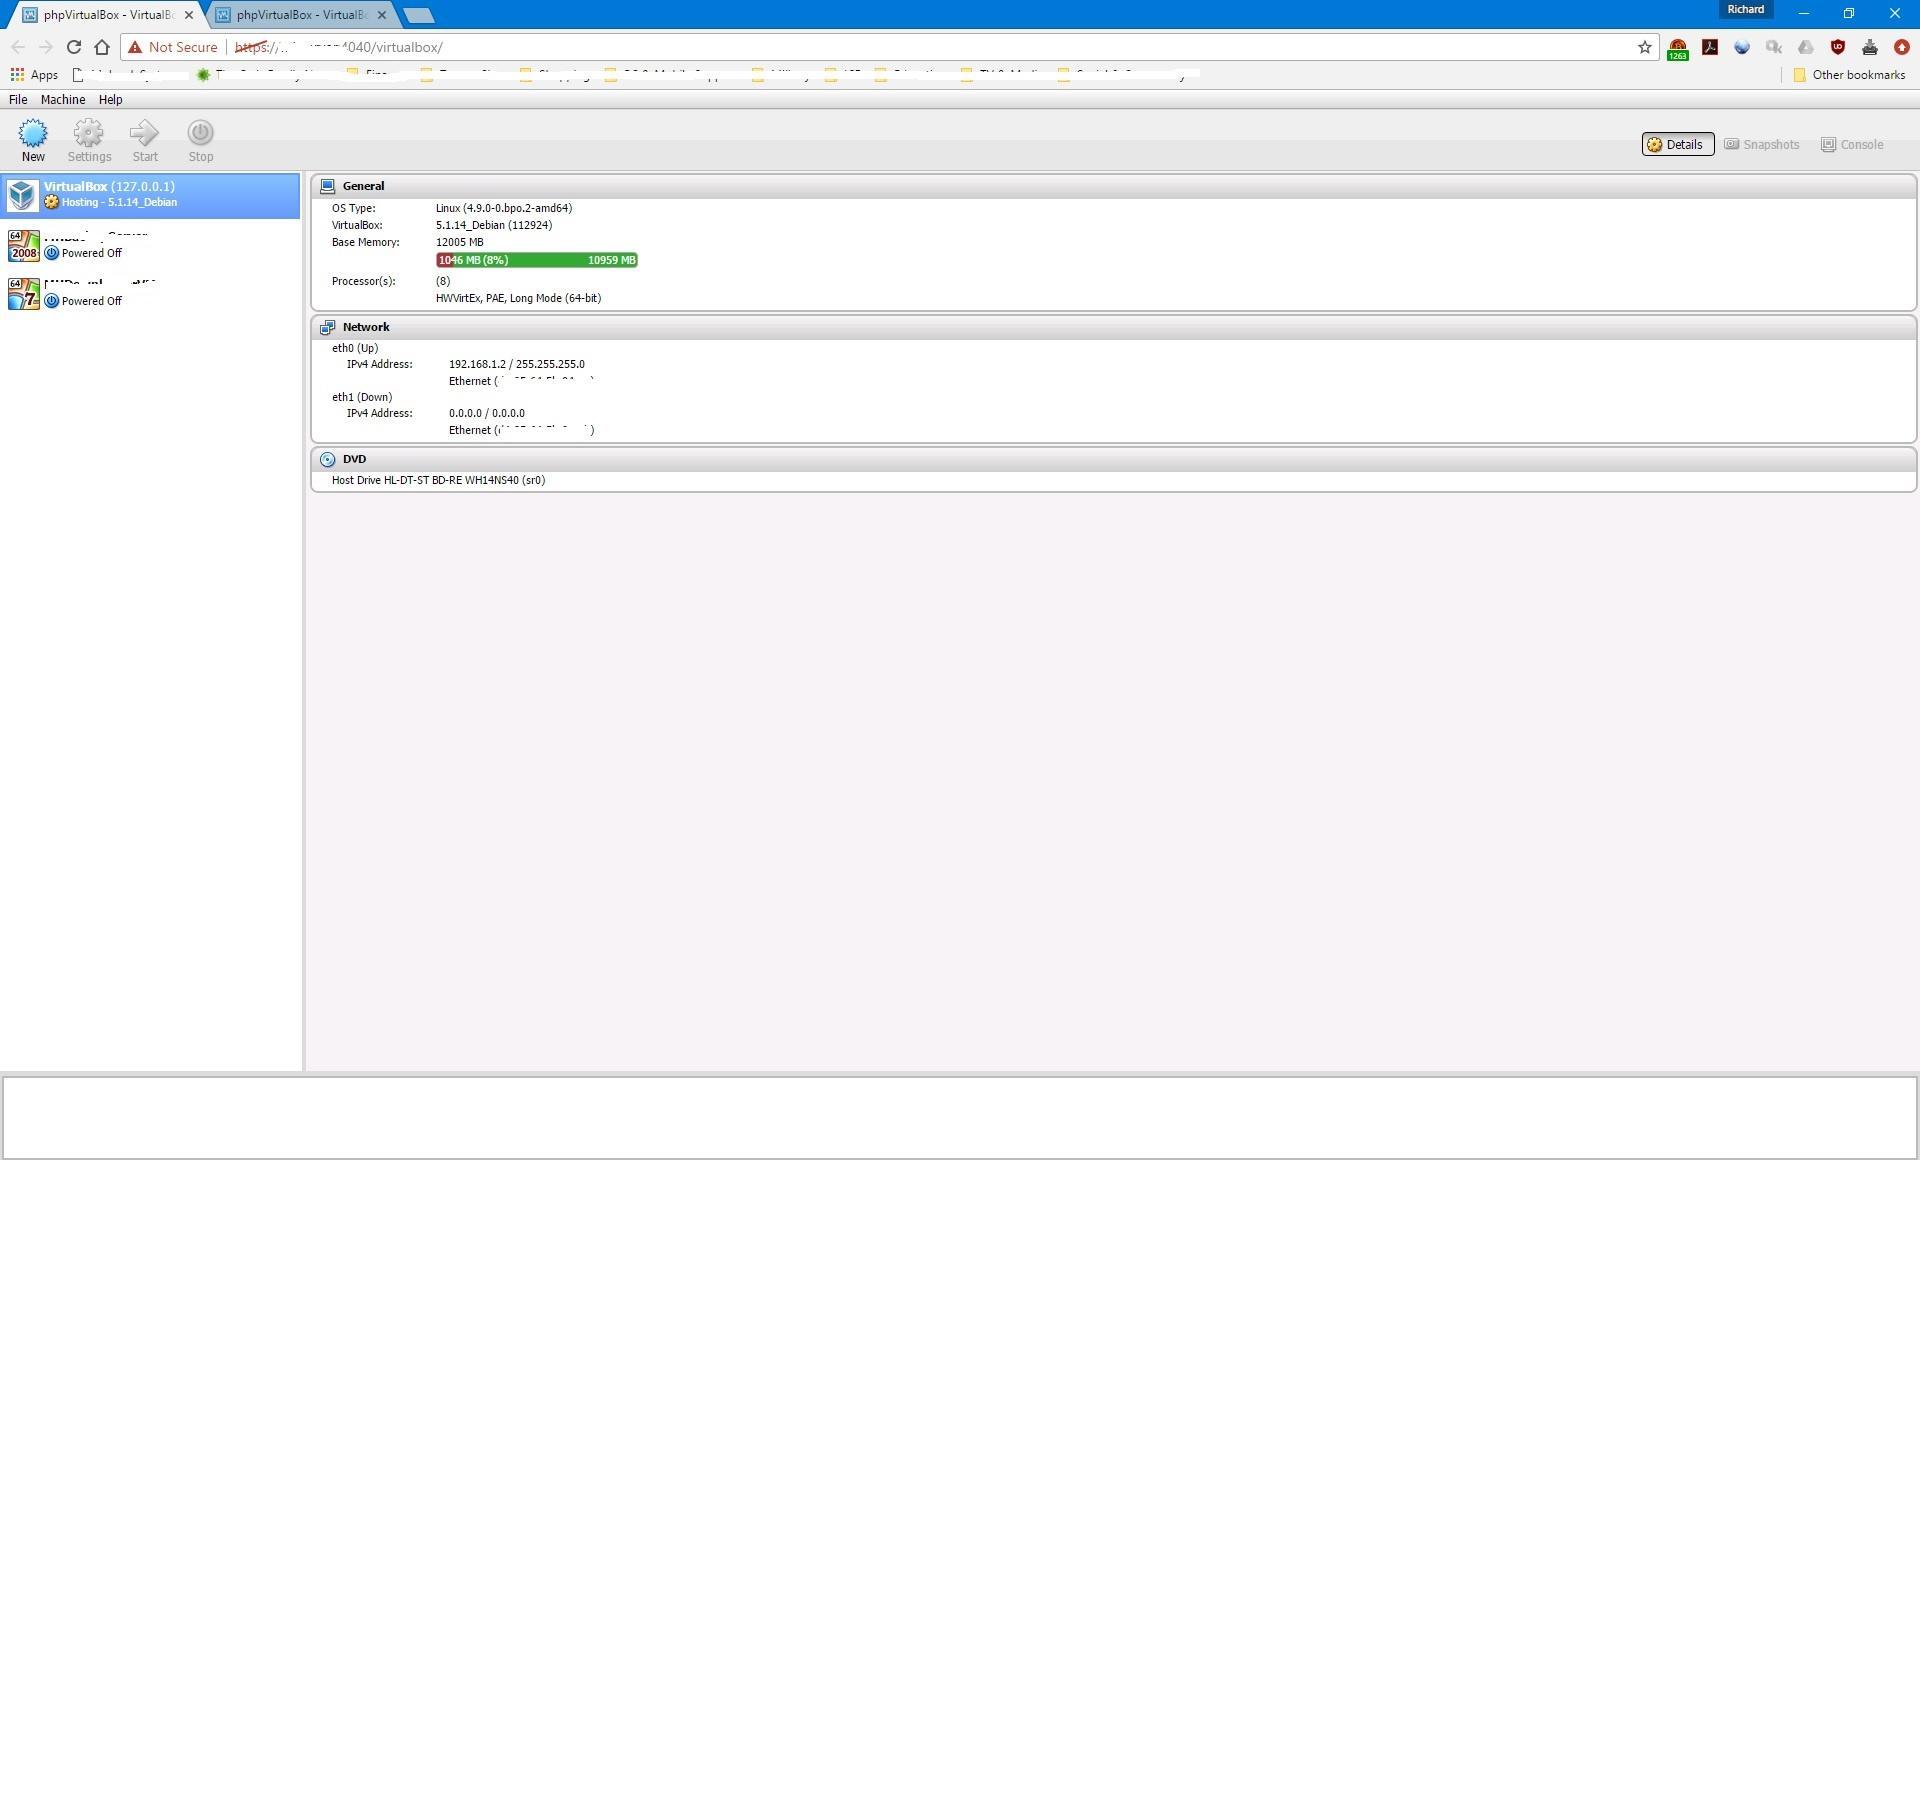 phpVirtualBox / Bugs / #64 SOAP Error Using VirtualBox 5 1